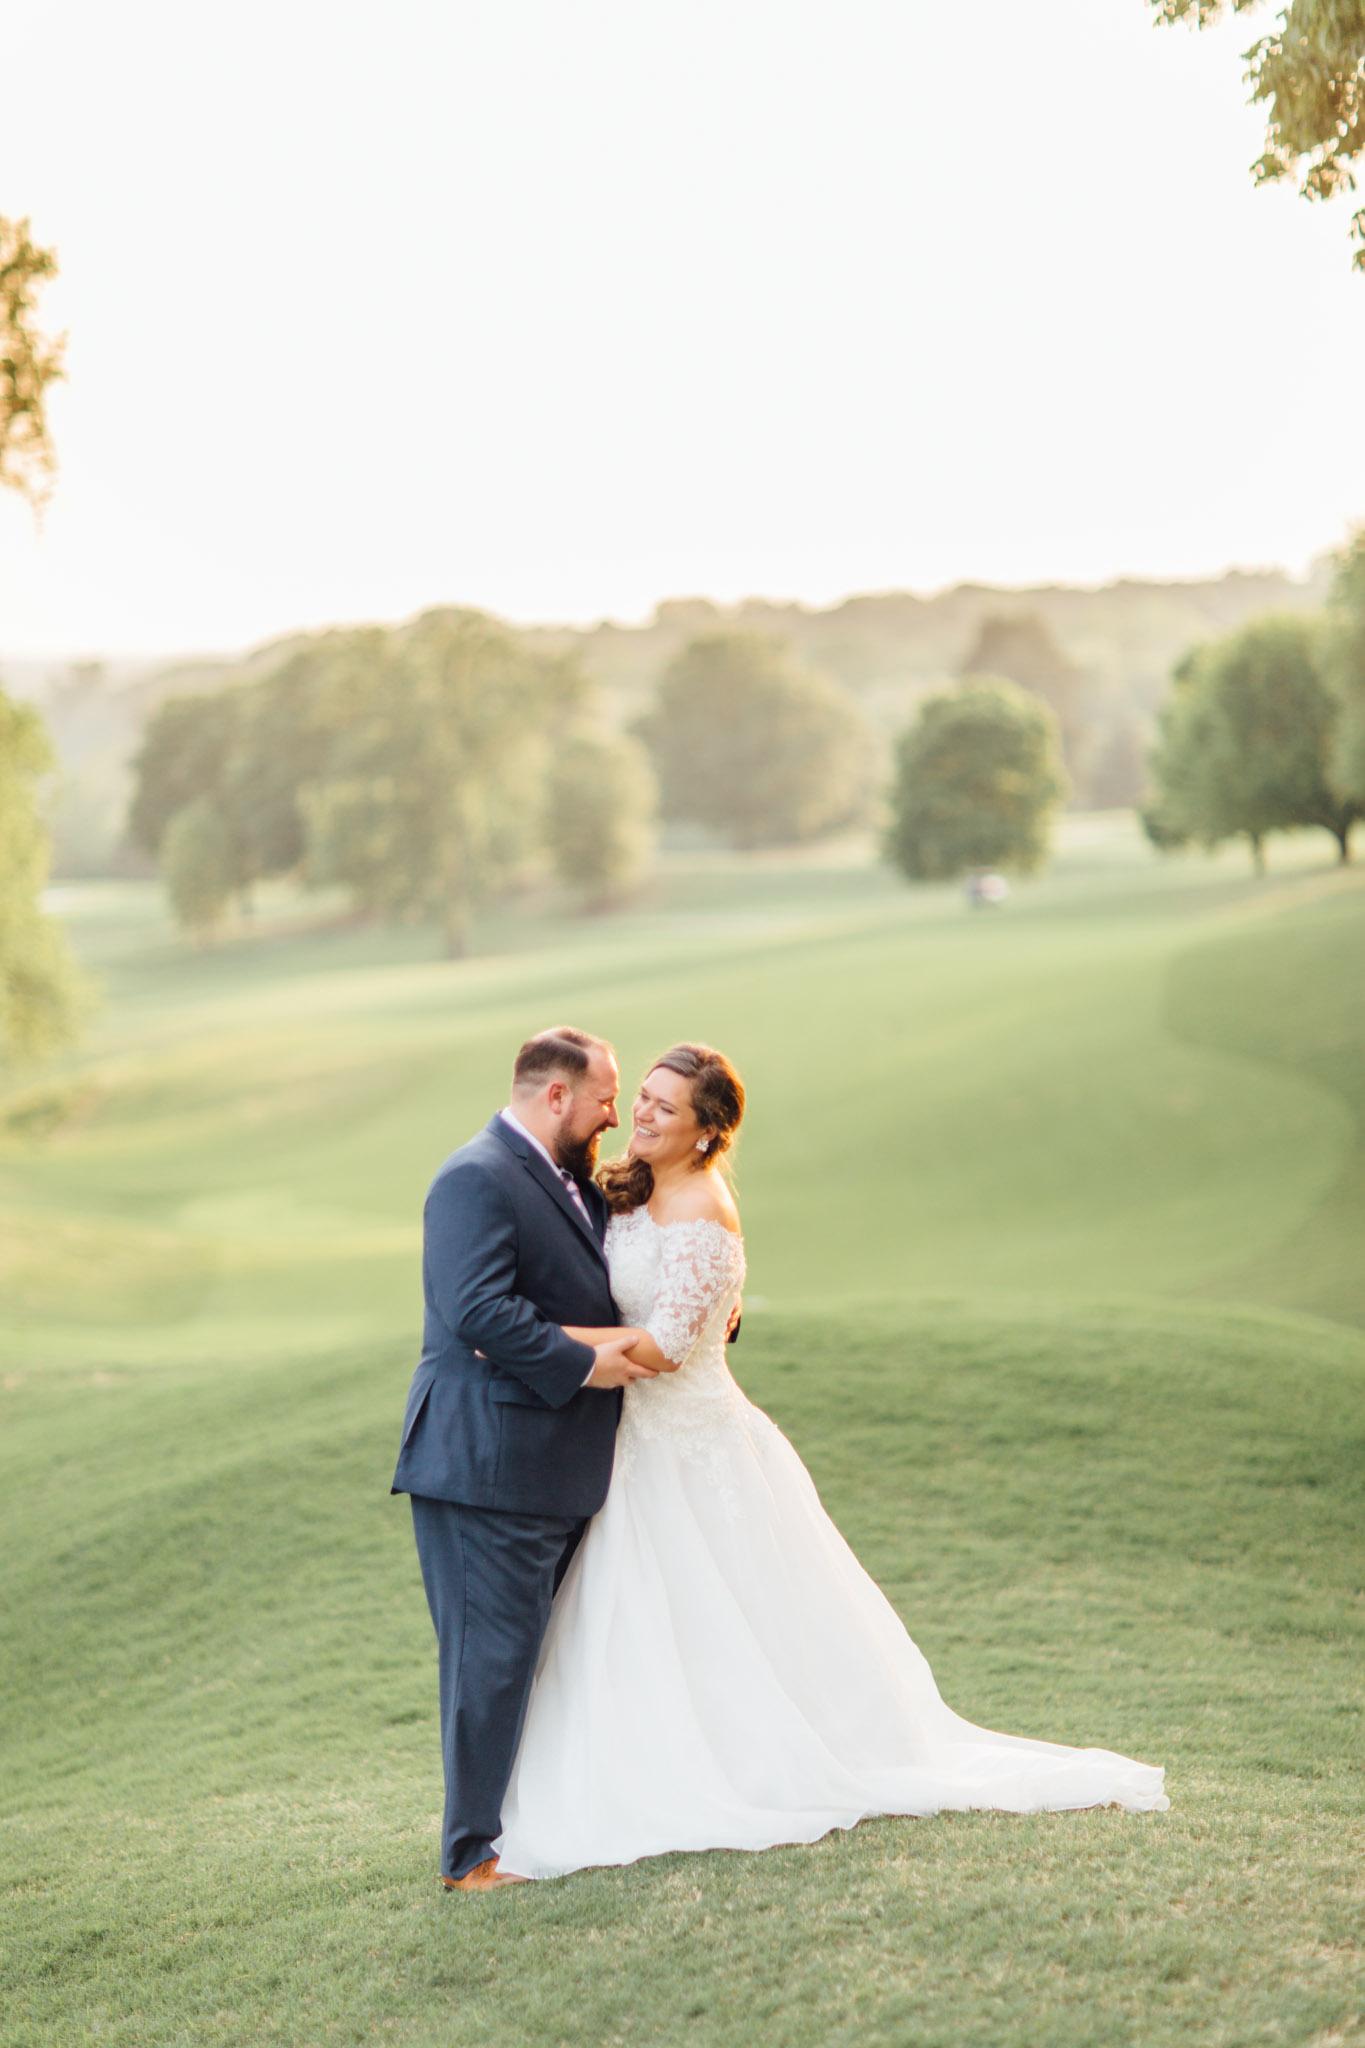 Country Club of Virginia Wedding Photographer_0097.jpg